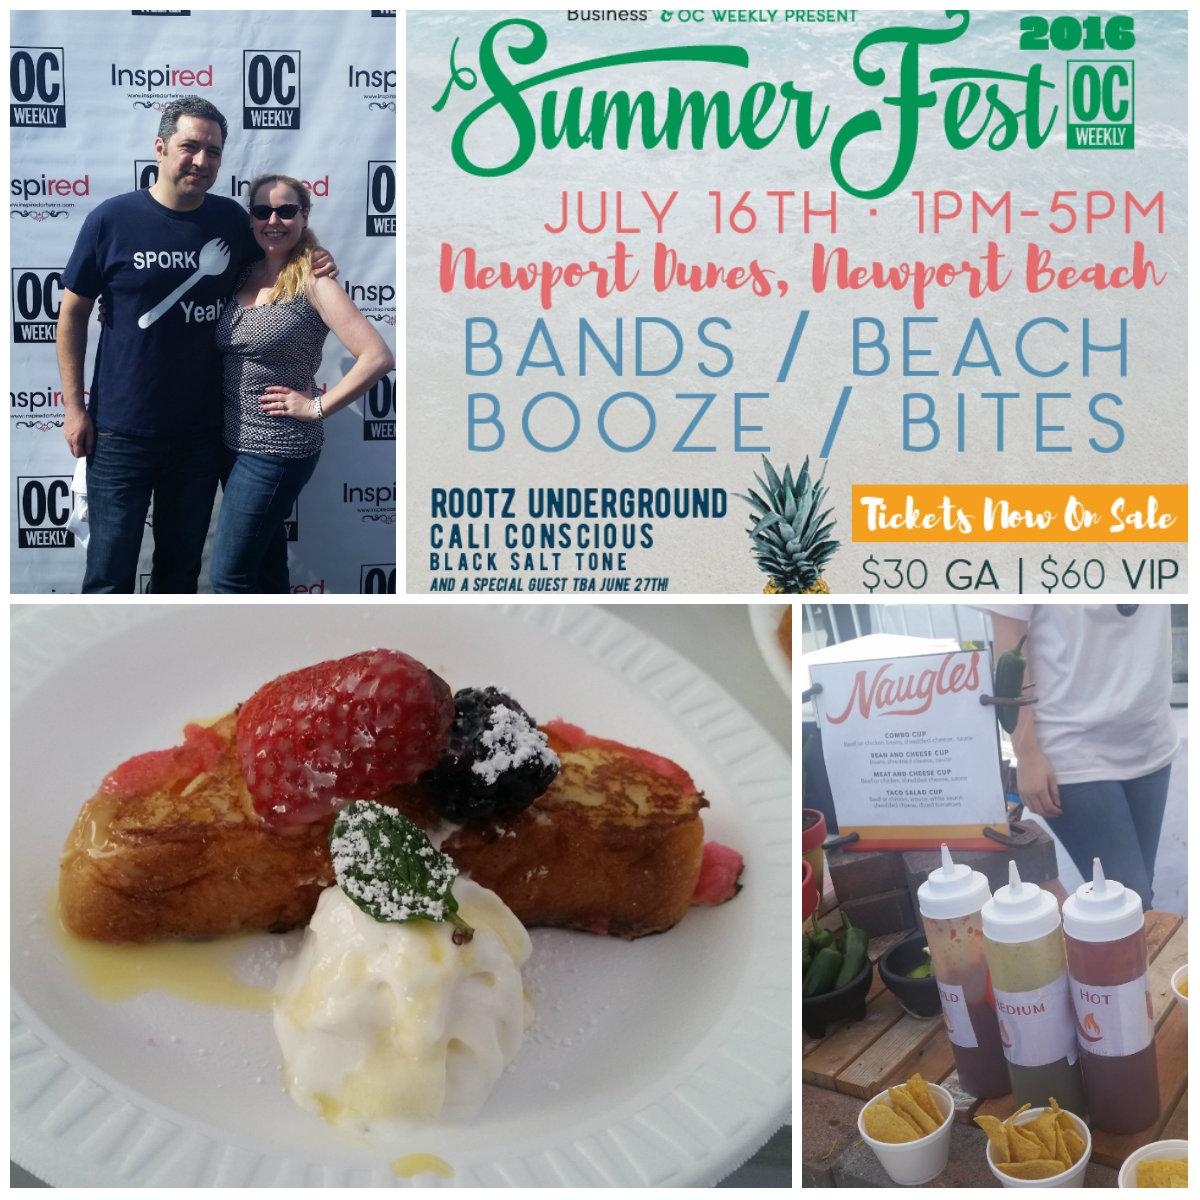 Summer Fest, OC Weekly, Newport Dunes, Events